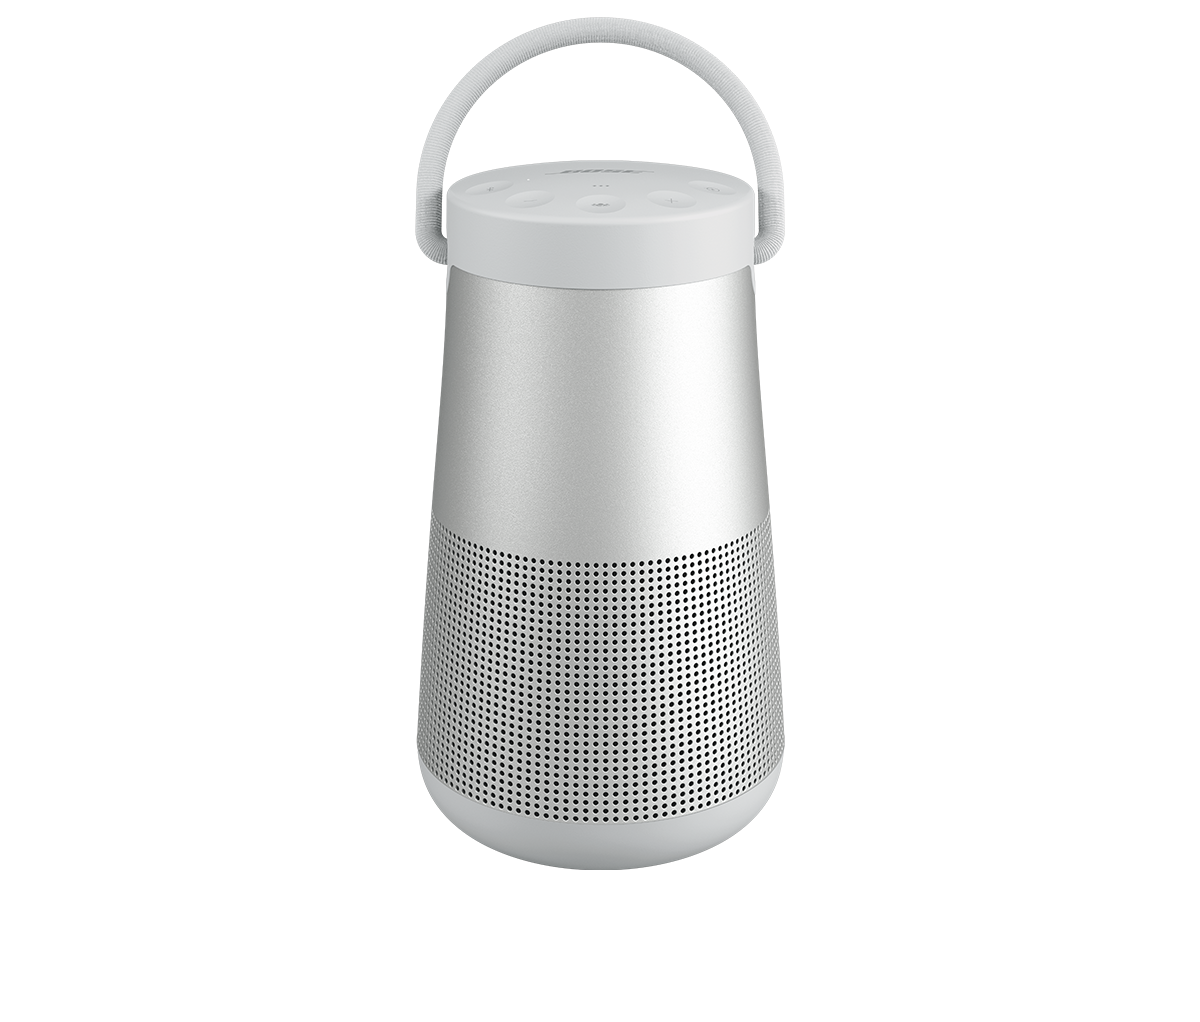 Bose Enceinte SoundLink Revolve+ Bluetooth